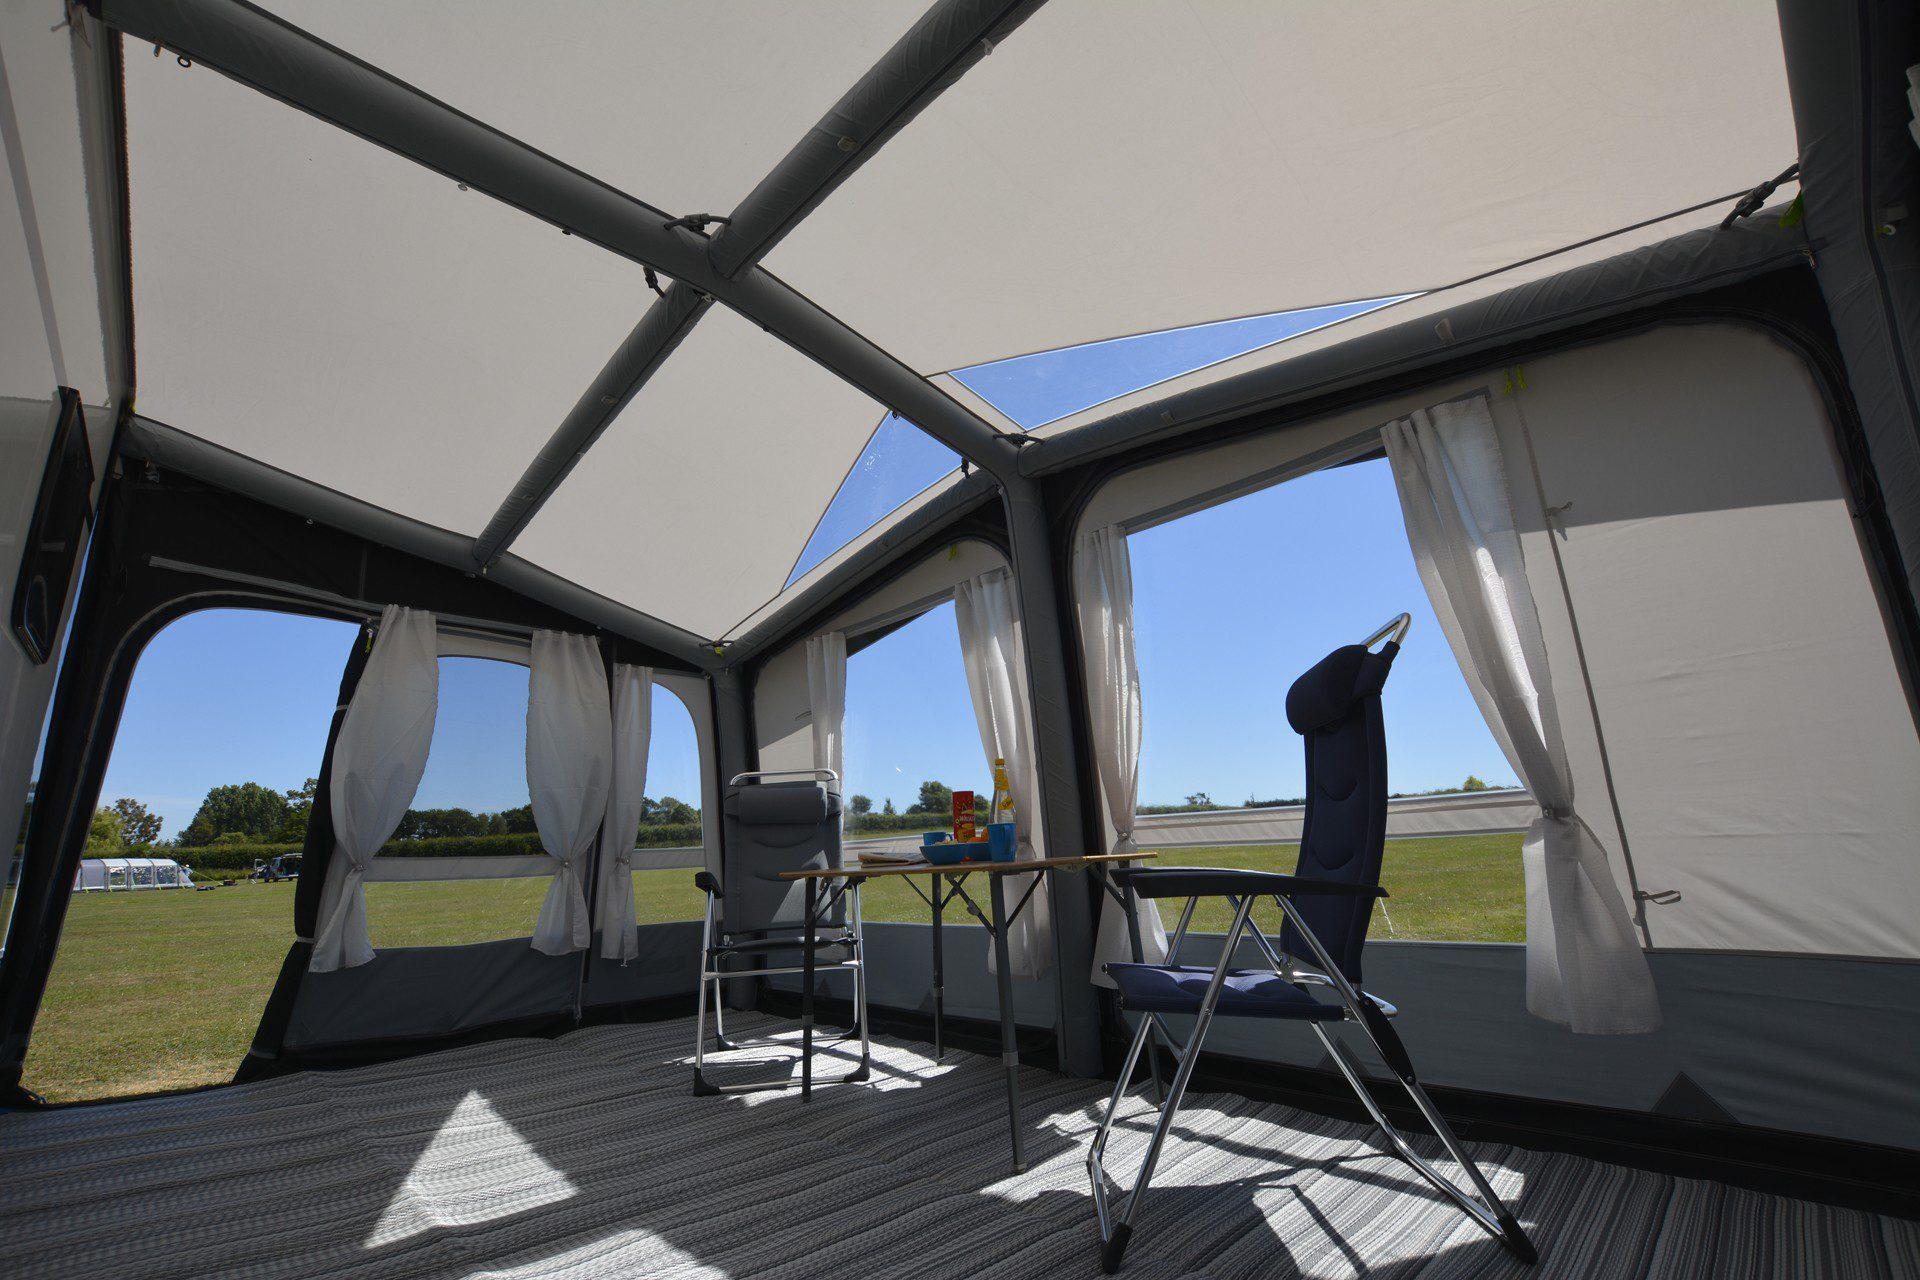 Kampa Club Air Pro 450 Caravan Awning 2019 8